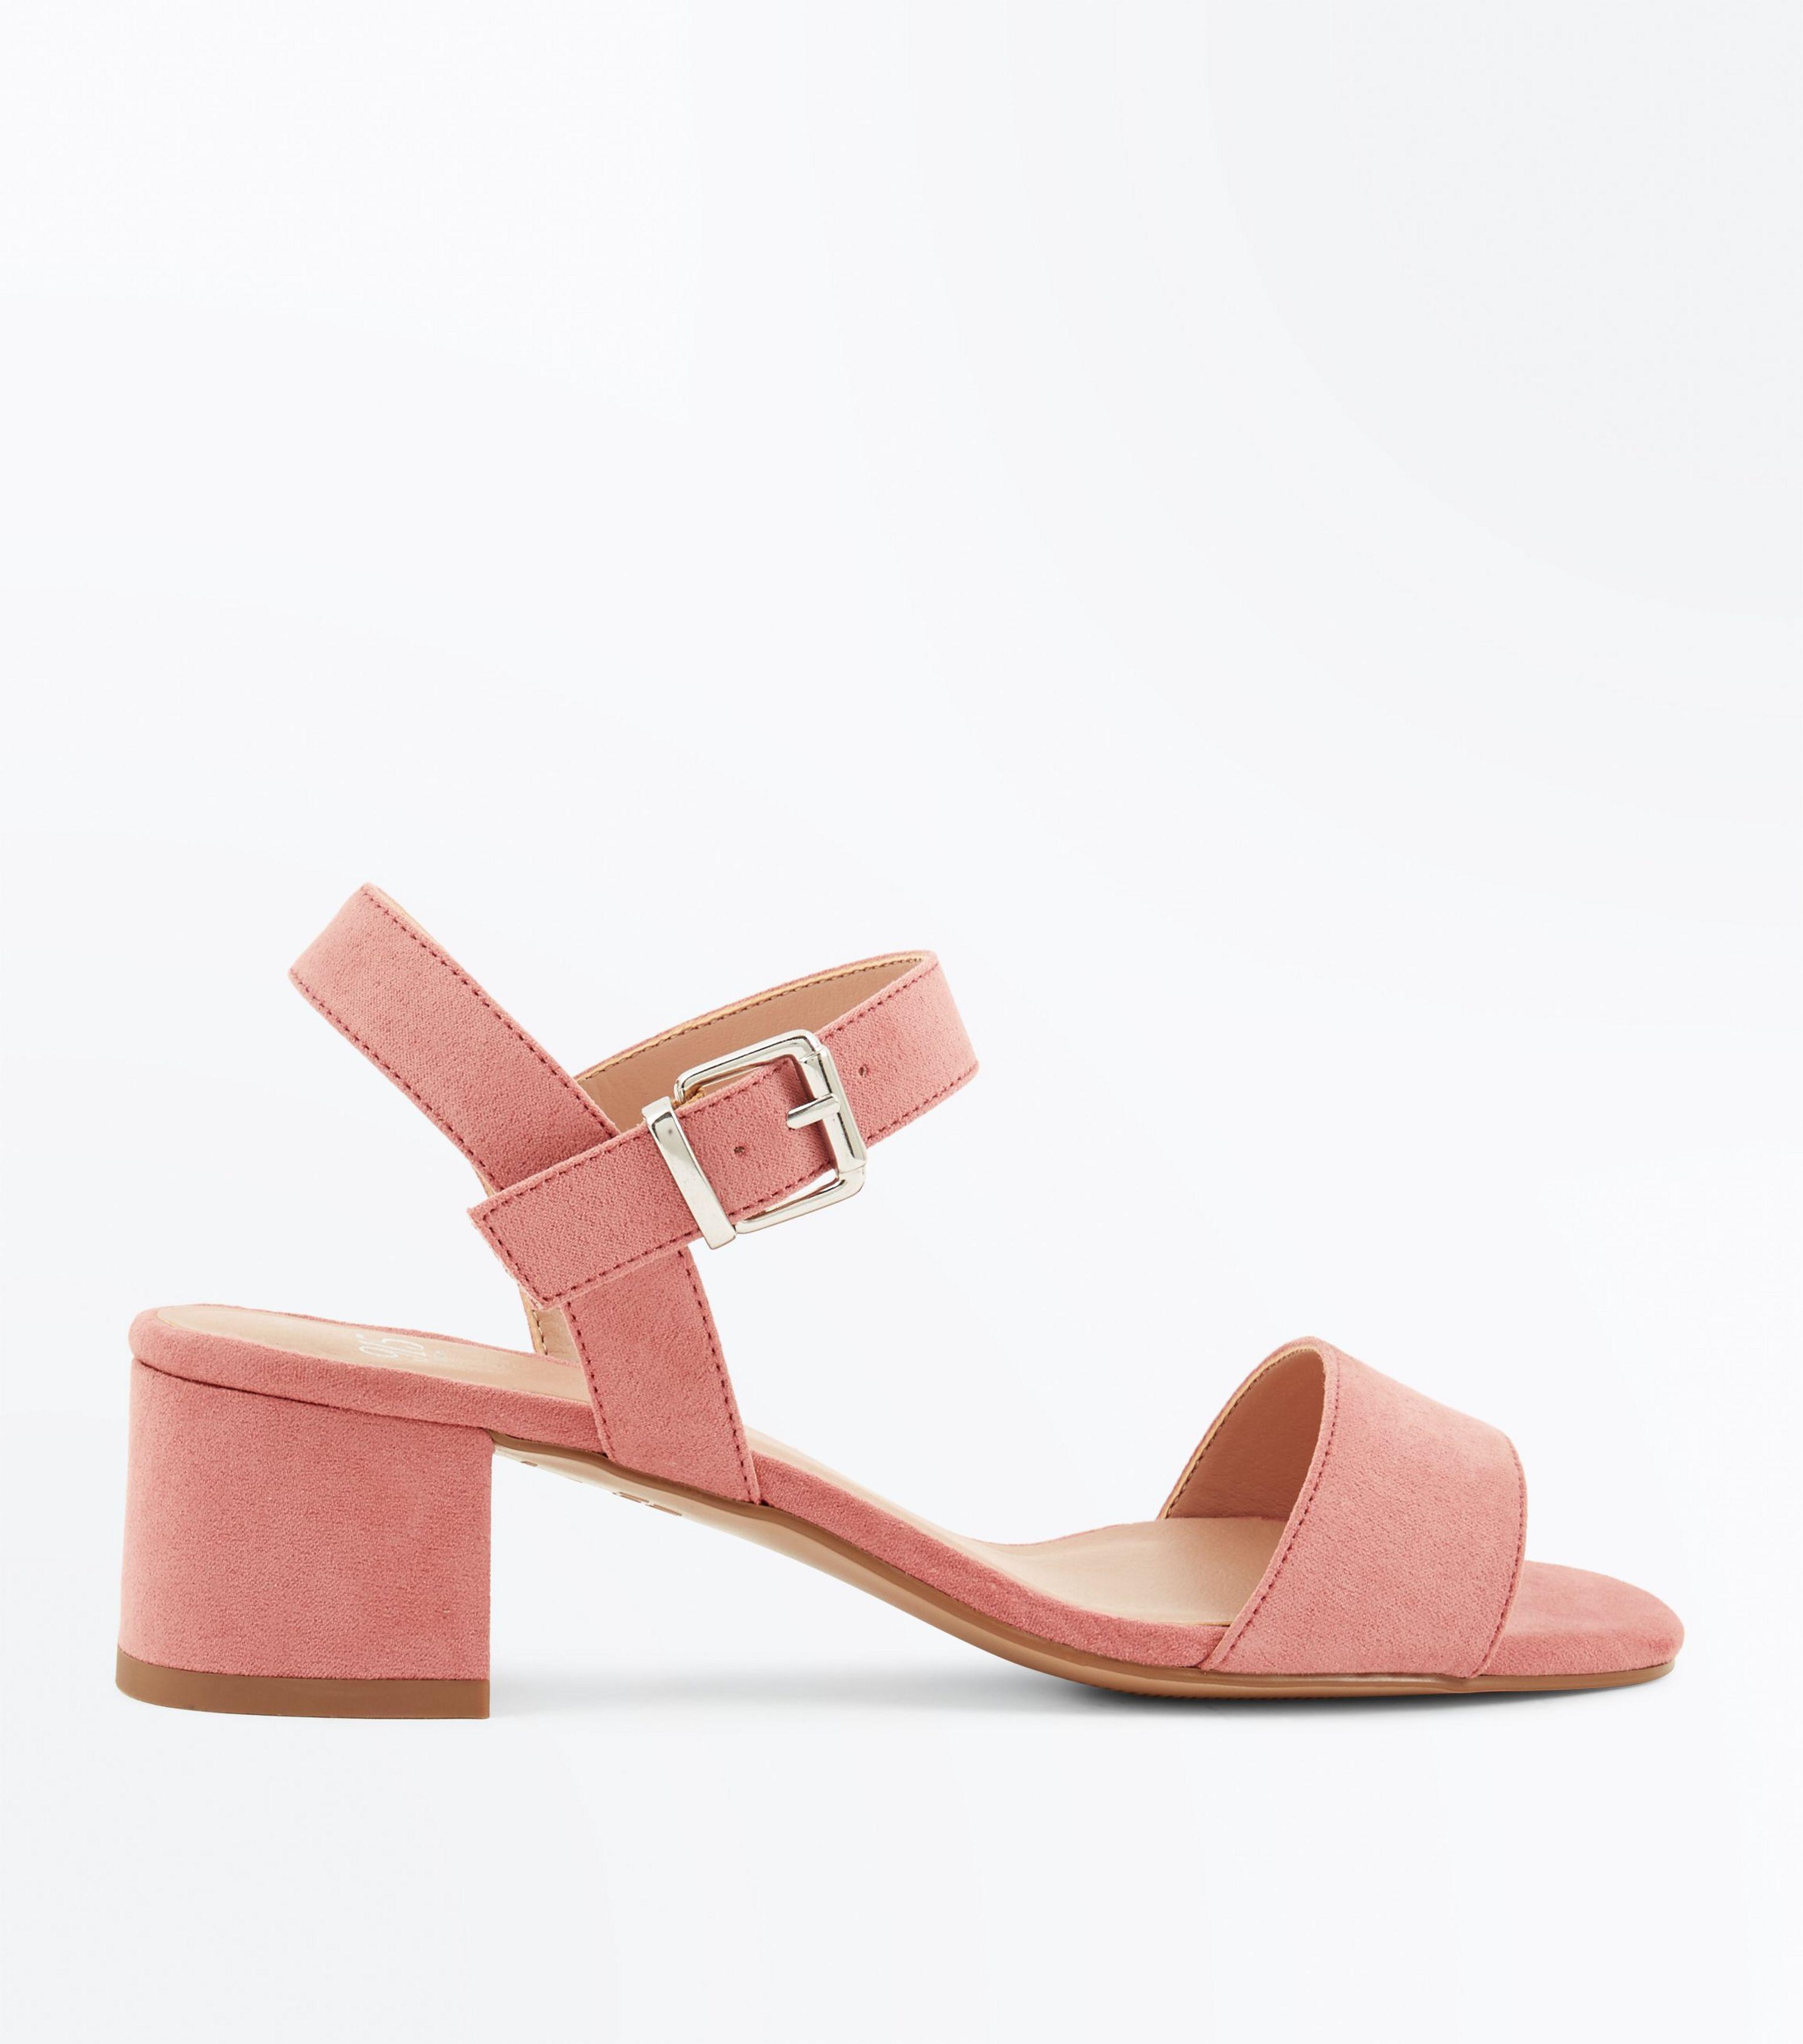 3fa2c94e83b New Look Teens Pink Suedette Block Heel Sandals in Pink - Lyst